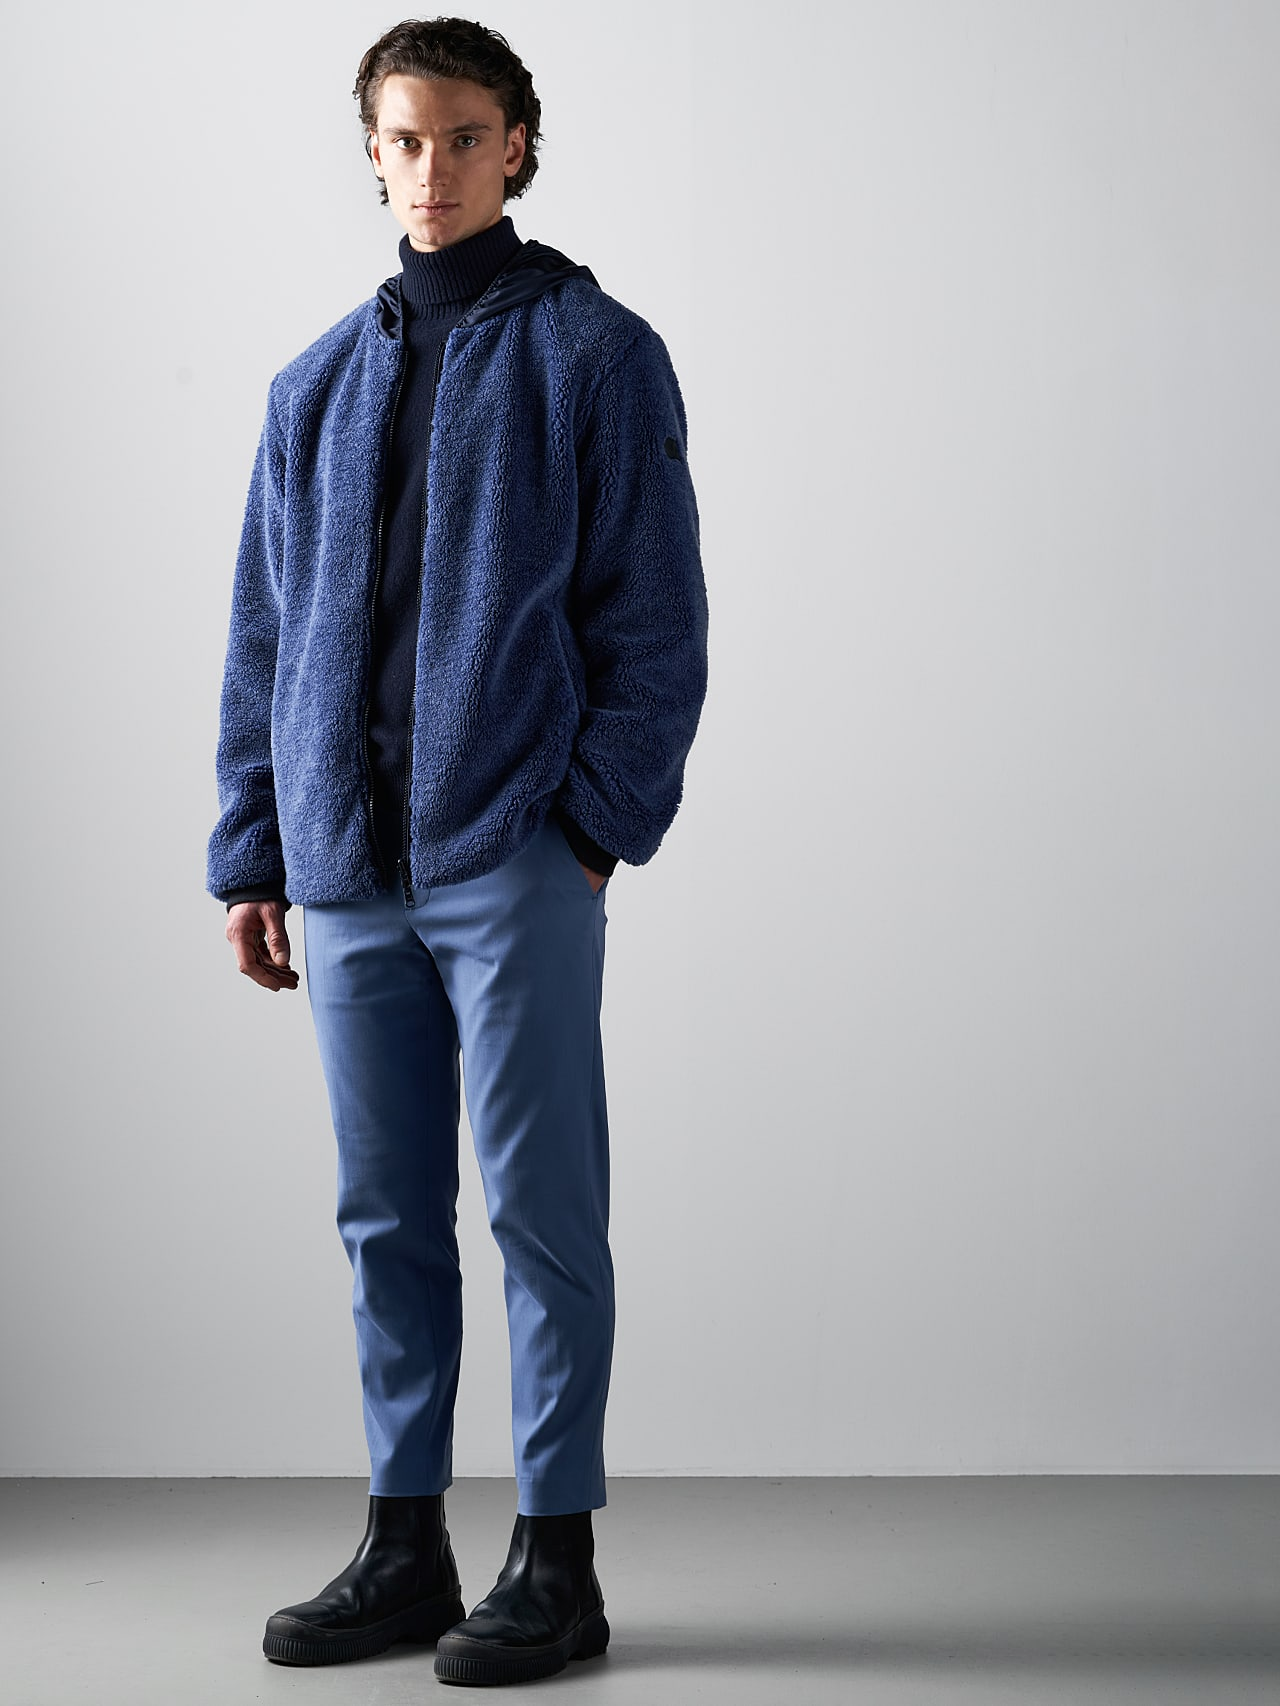 OVEDY V1.Y5.02 Reversible Wool-Blend Teddy Jacket light blue Front Alpha Tauri